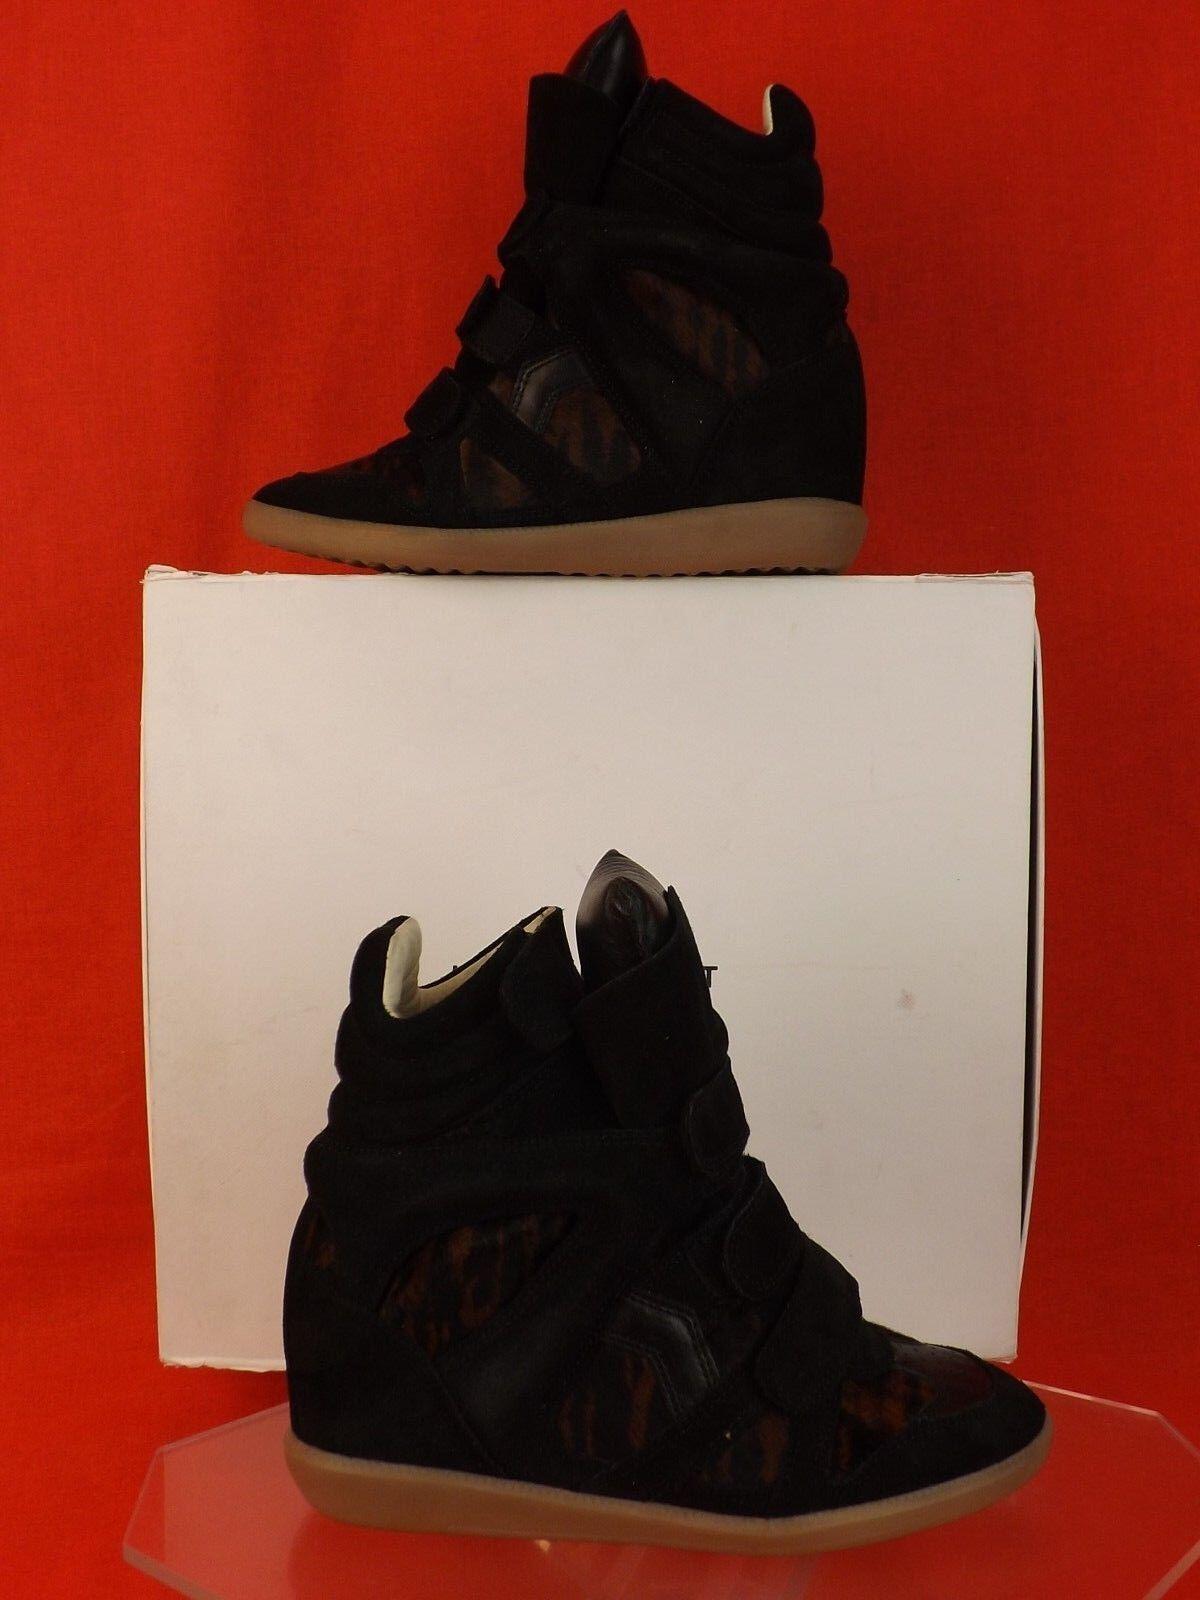 Nuevo En Caja Isabel Marant Etoile Negro Negro Negro Gamuza Pony Cabello Benett Plataforma Tenis 38  810  barato y de alta calidad